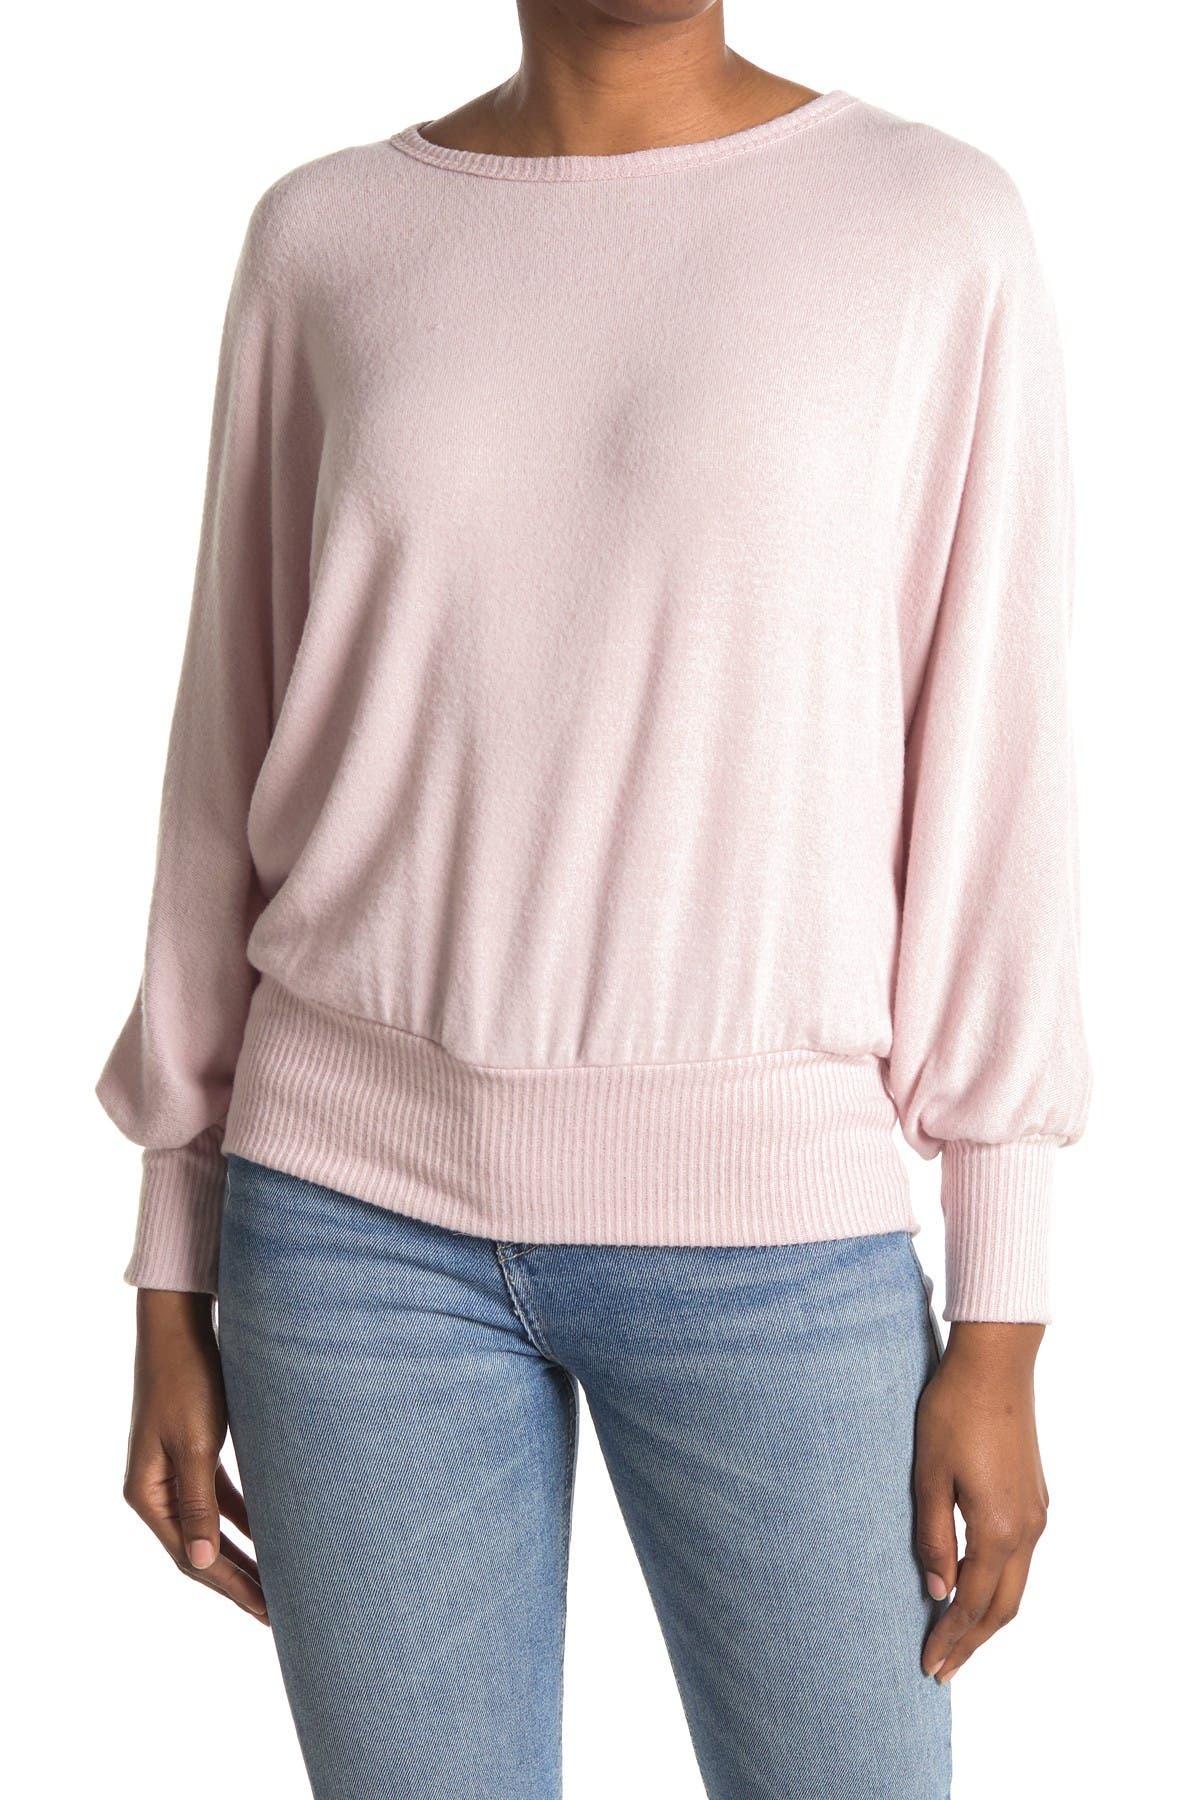 Image of Lush Long Sleeve Brushed Knit Top